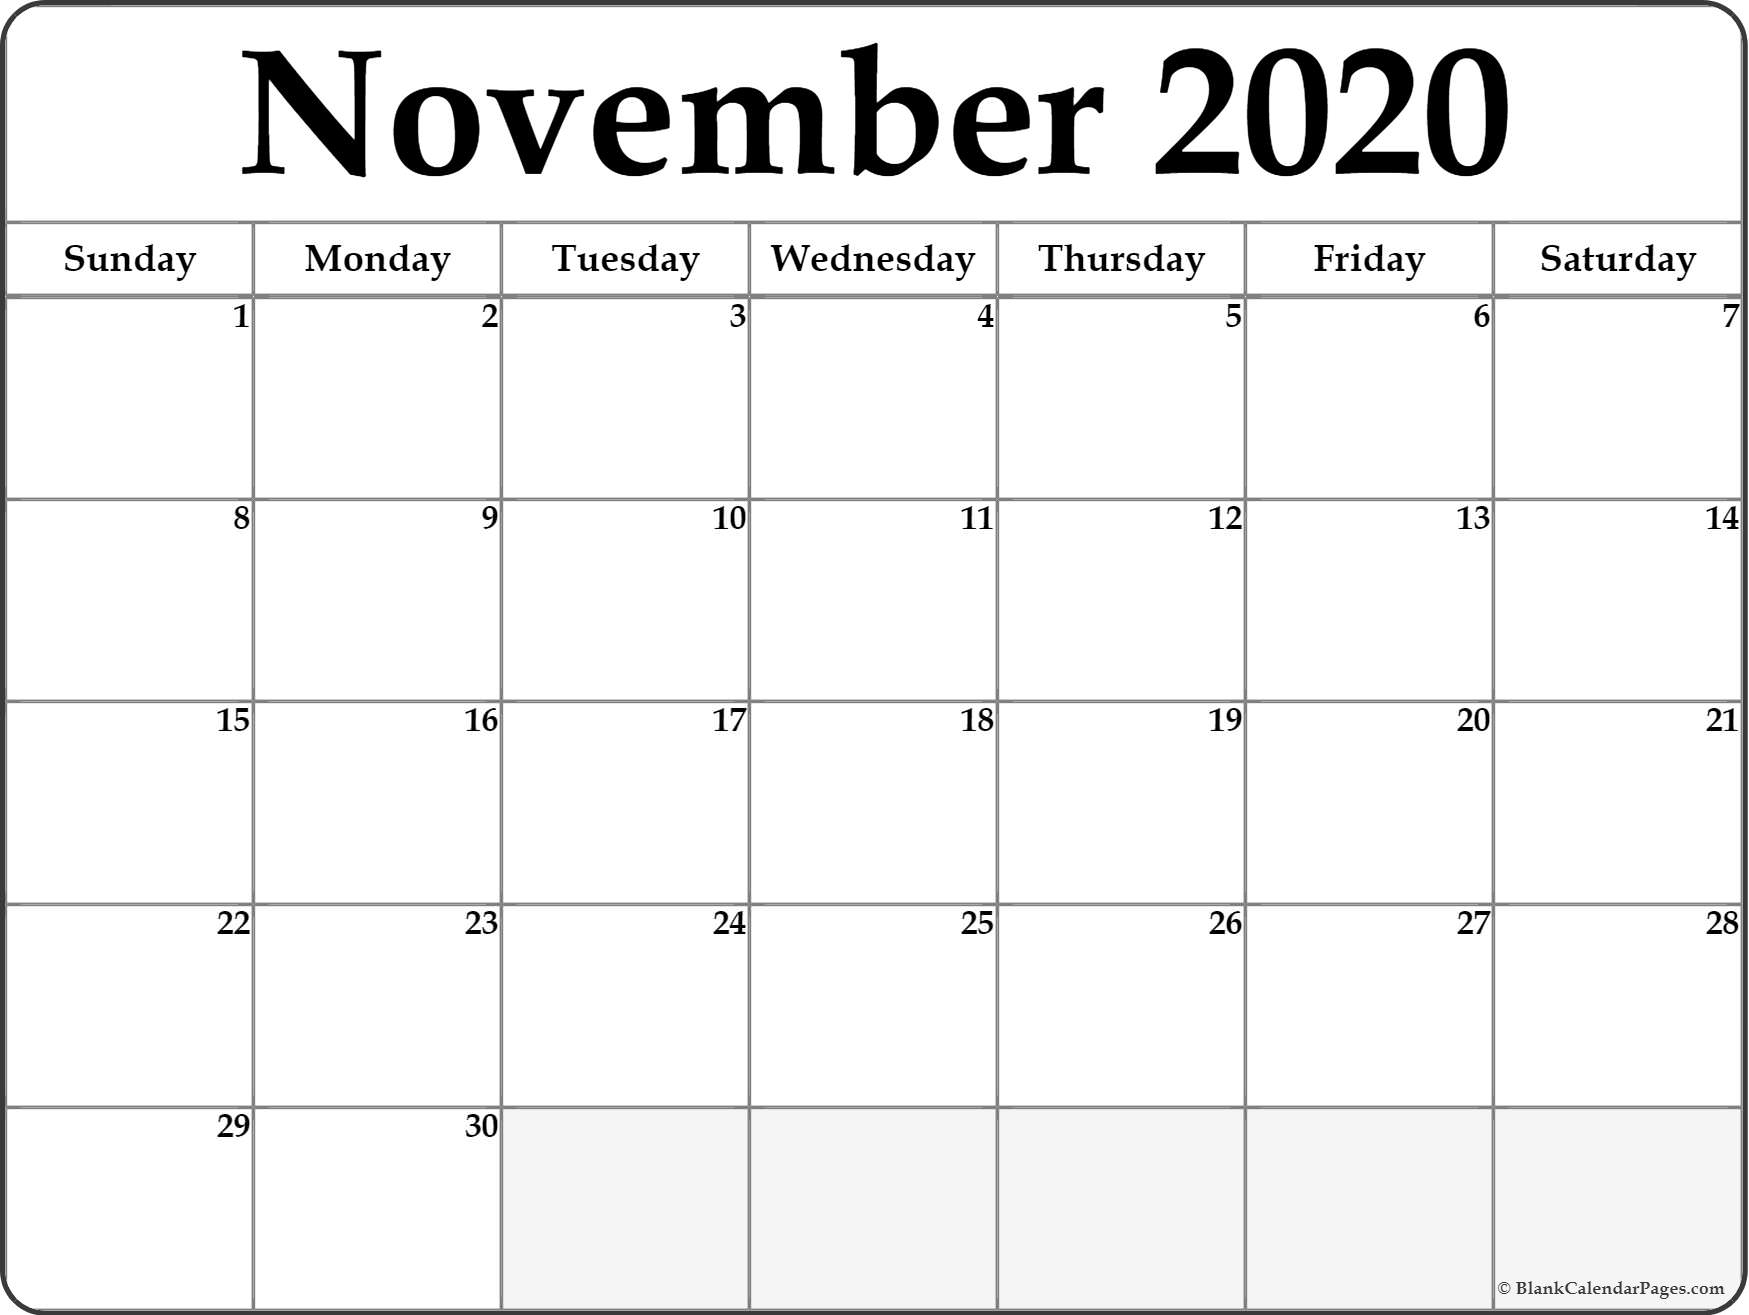 Print Calendar November 2020 - Wpa.wpart.co